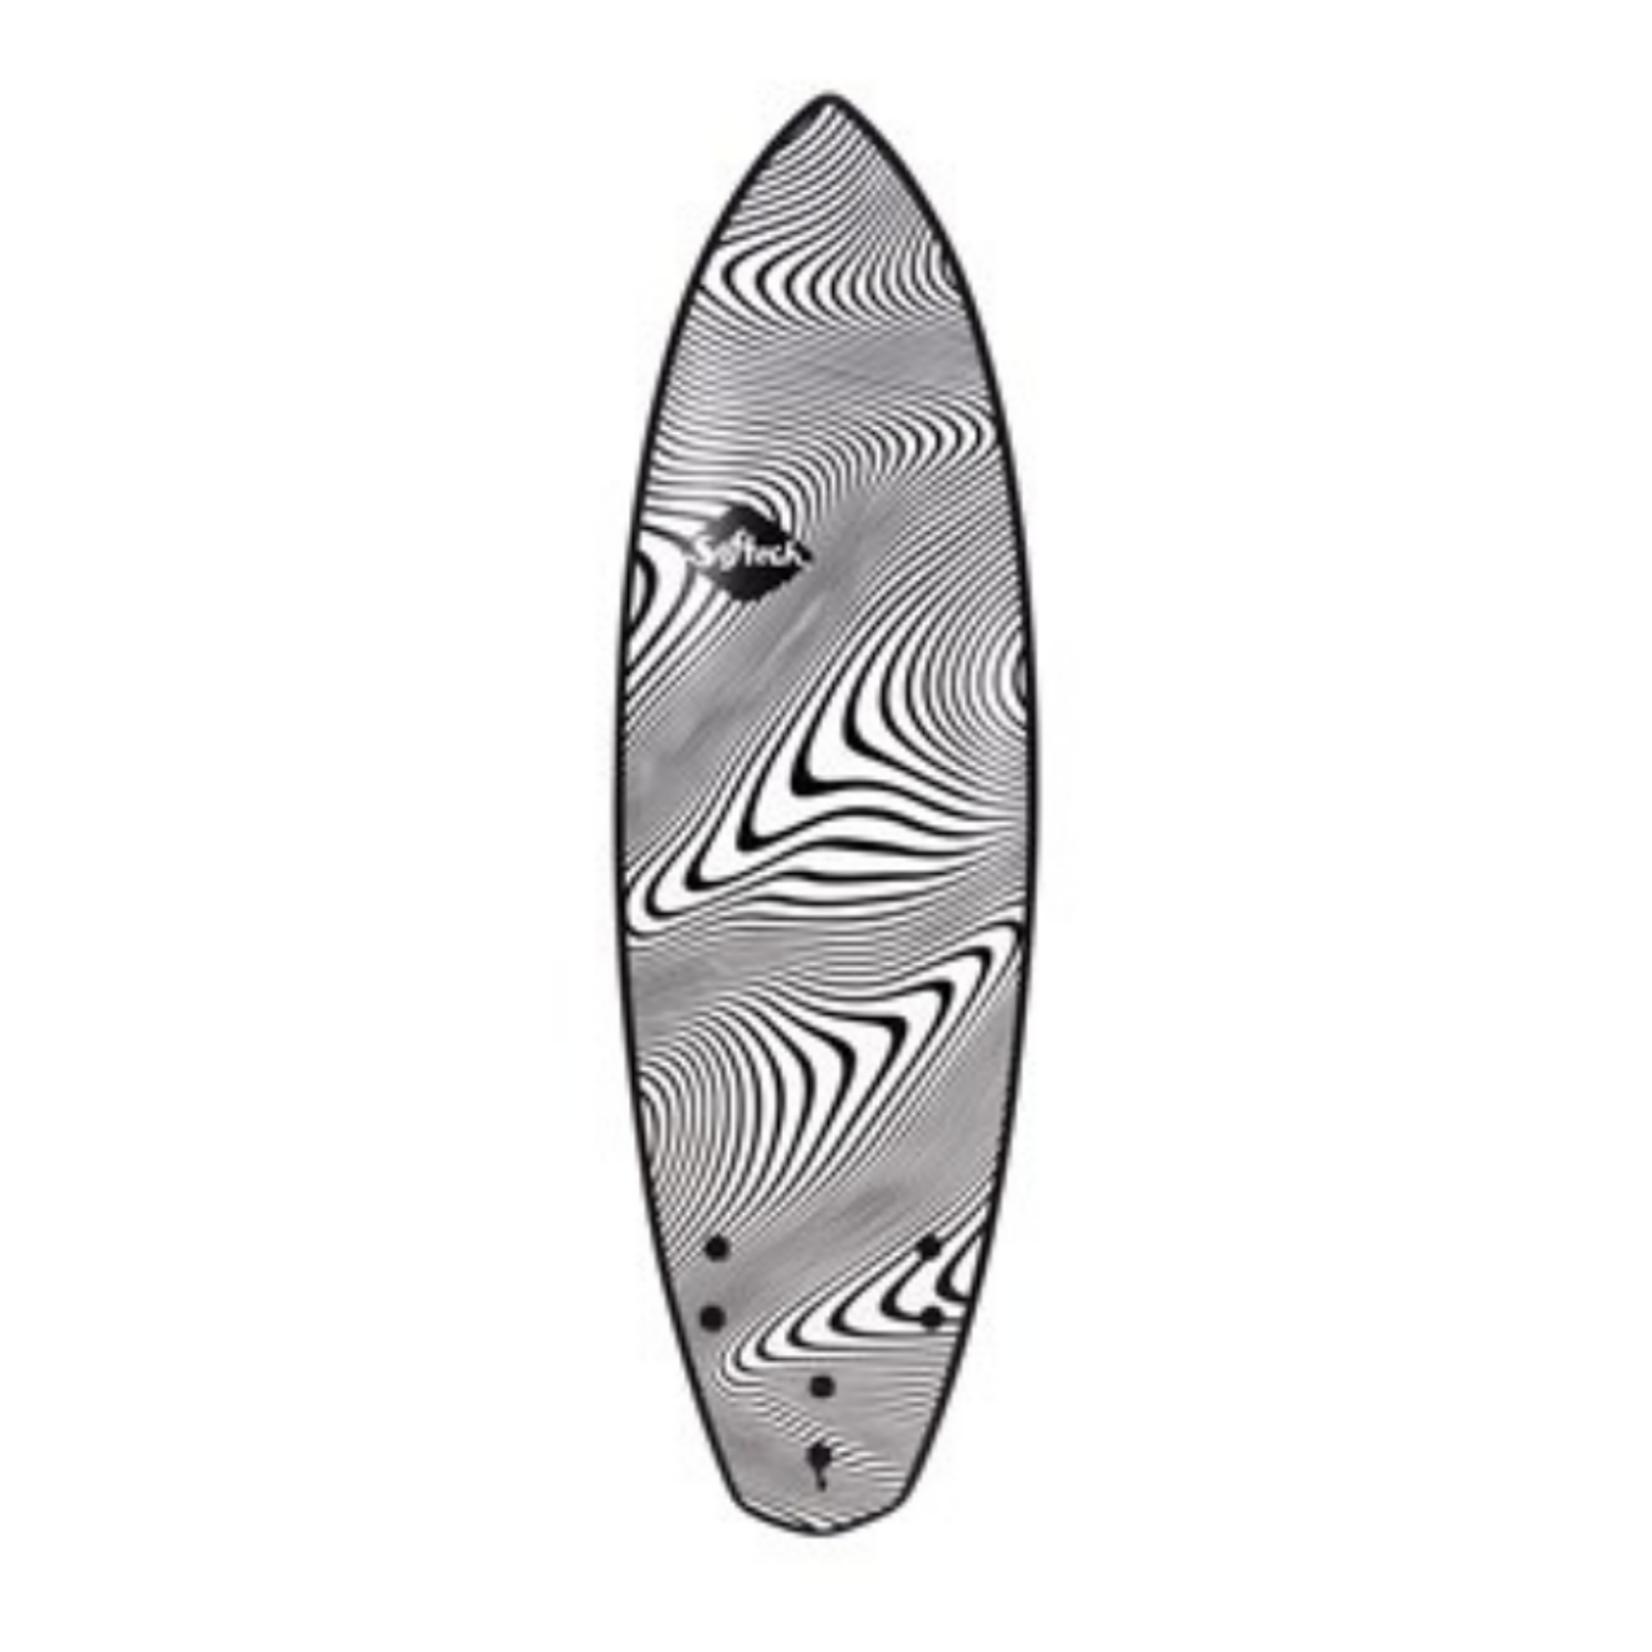 Softech Surfboards Softec Toledo Wildfire 5'11